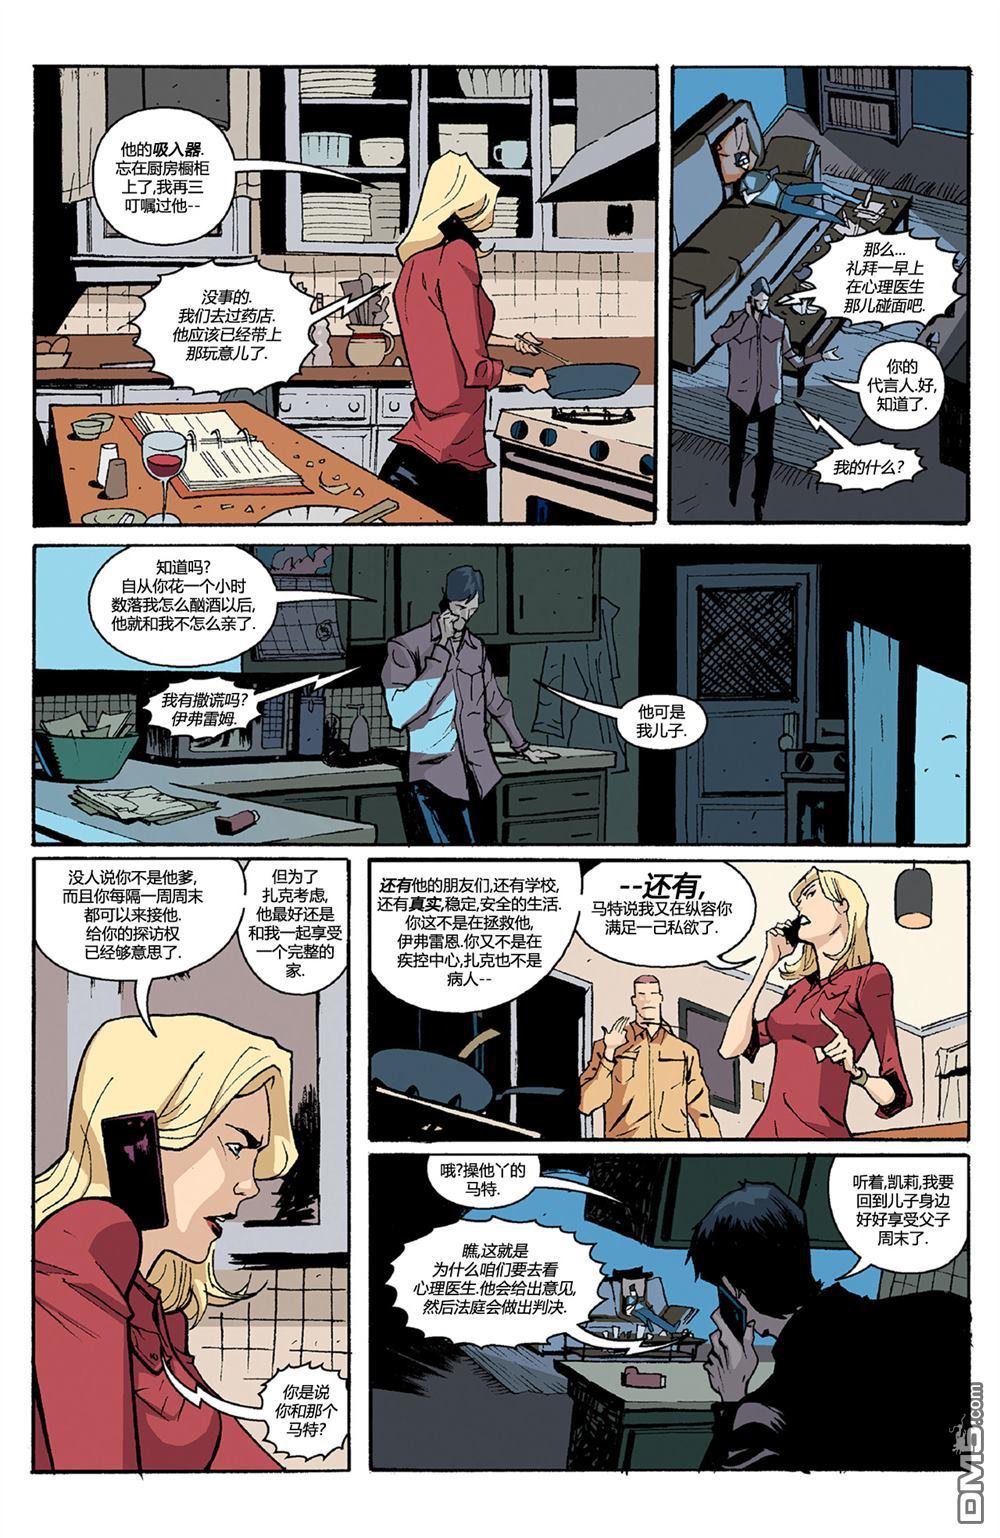 kmart kitchen stools 血族第1話 第13頁 劇情 奴奴漫畫